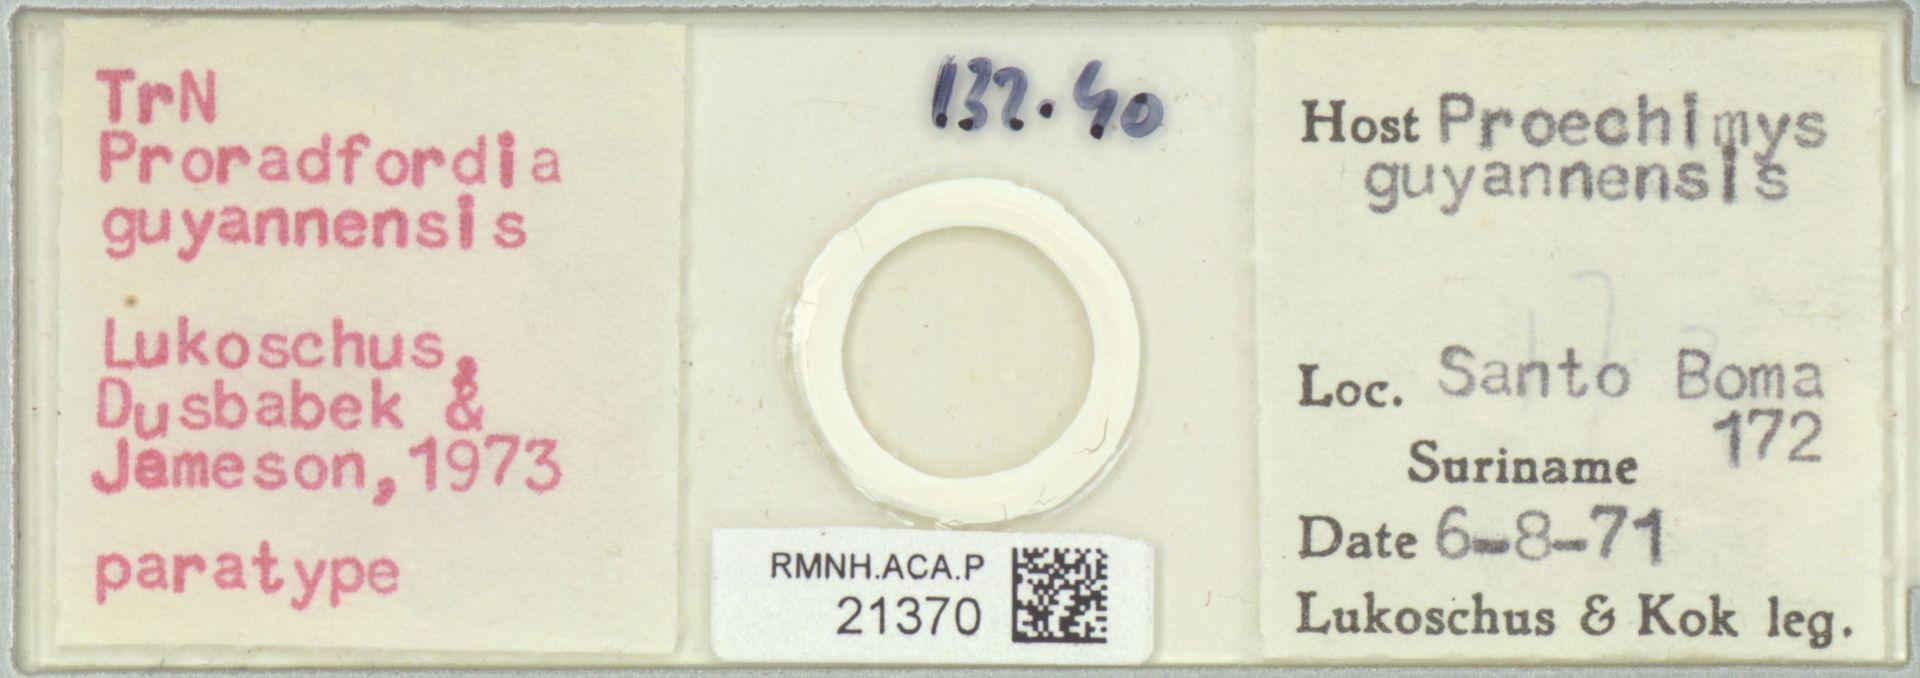 RMNH.ACA.P.21370   Proradfordia guyannensis